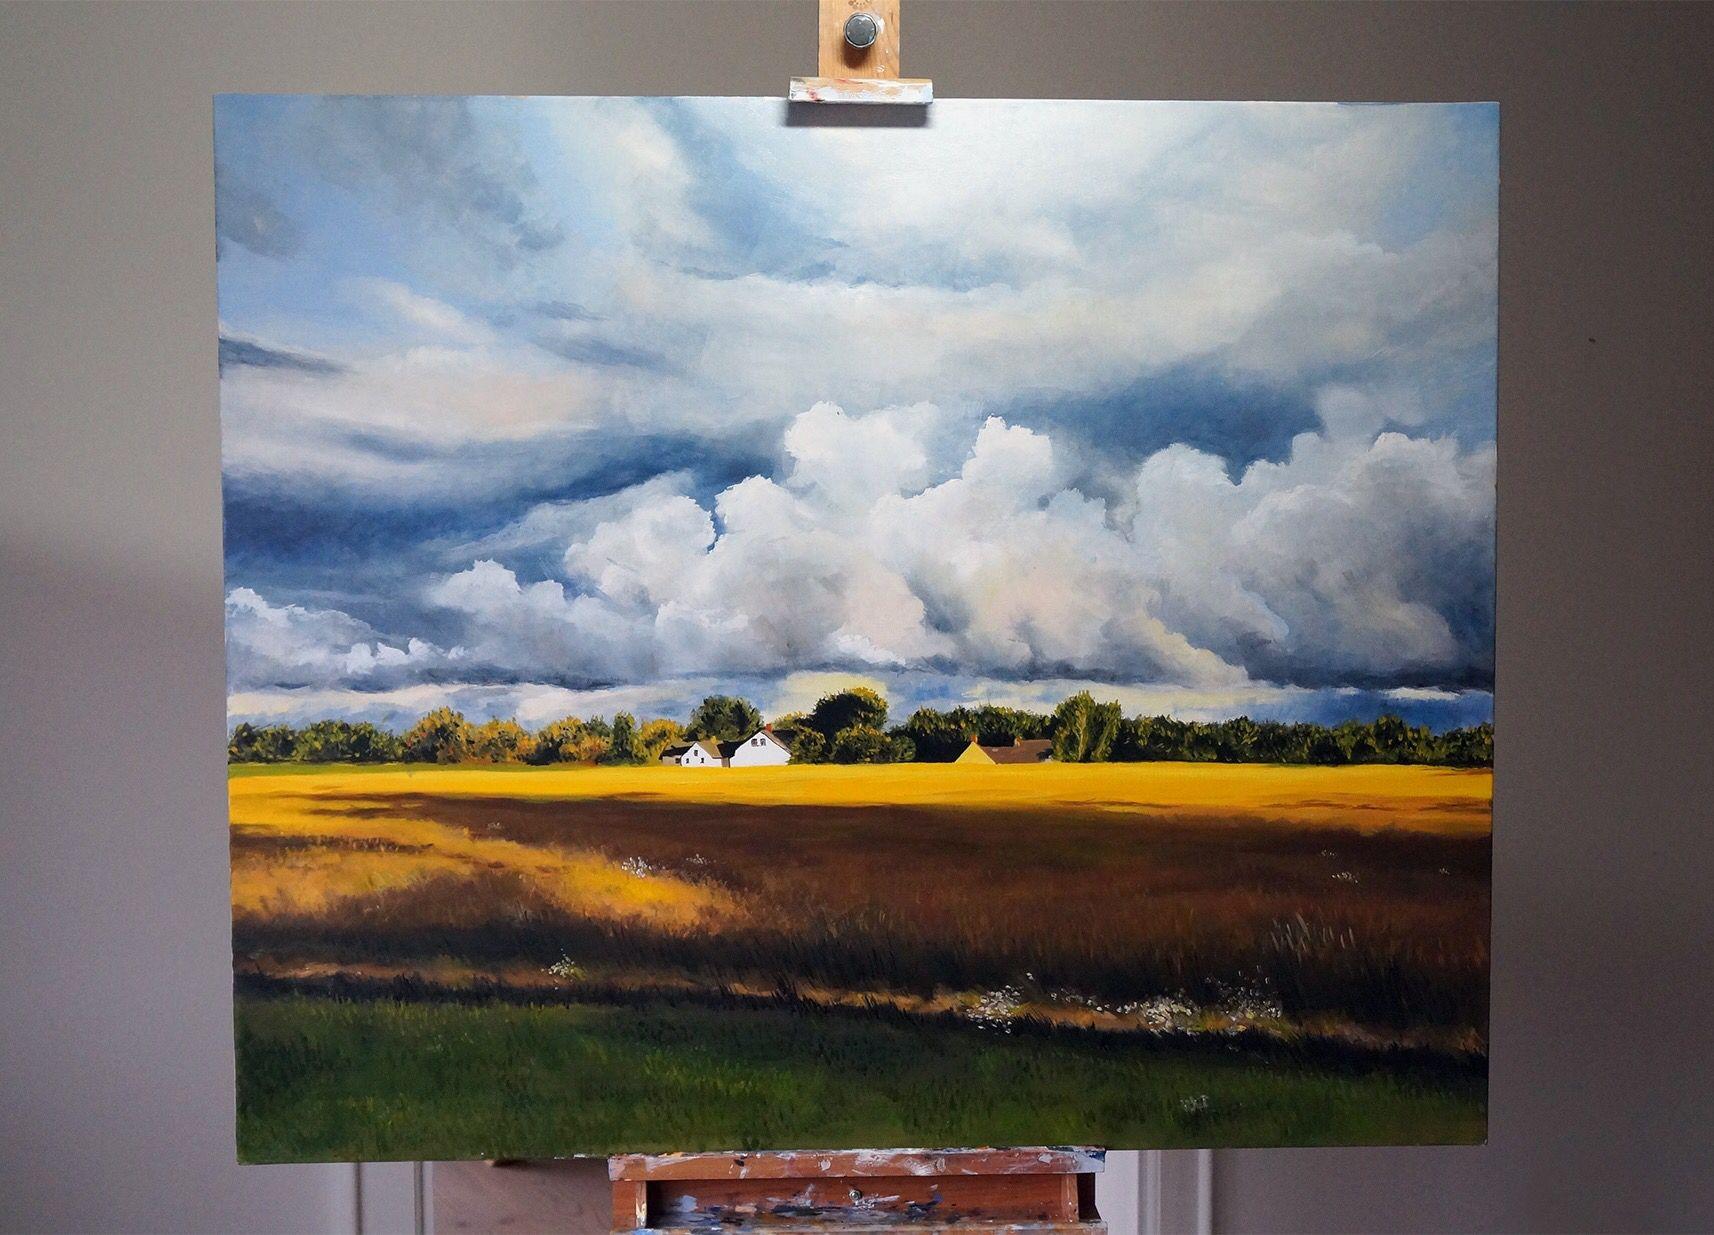 """View from Kikhavn"". Painting by Jonas Linell 2016, oil on canvas, 120 x 100 cm. Price: €1400 / £1200 / $1500. See more of my works at jonaslinell.com #jonaslinell #art #painting #landscape #kikhavn #oil #oiloncanvas #canvas #artwork #country #countryside #landskab #kusnt #maleri #olie #lærred #nordsjællan #hundested #denmark #clouds #skyer #sky #himmel #fields #mark"